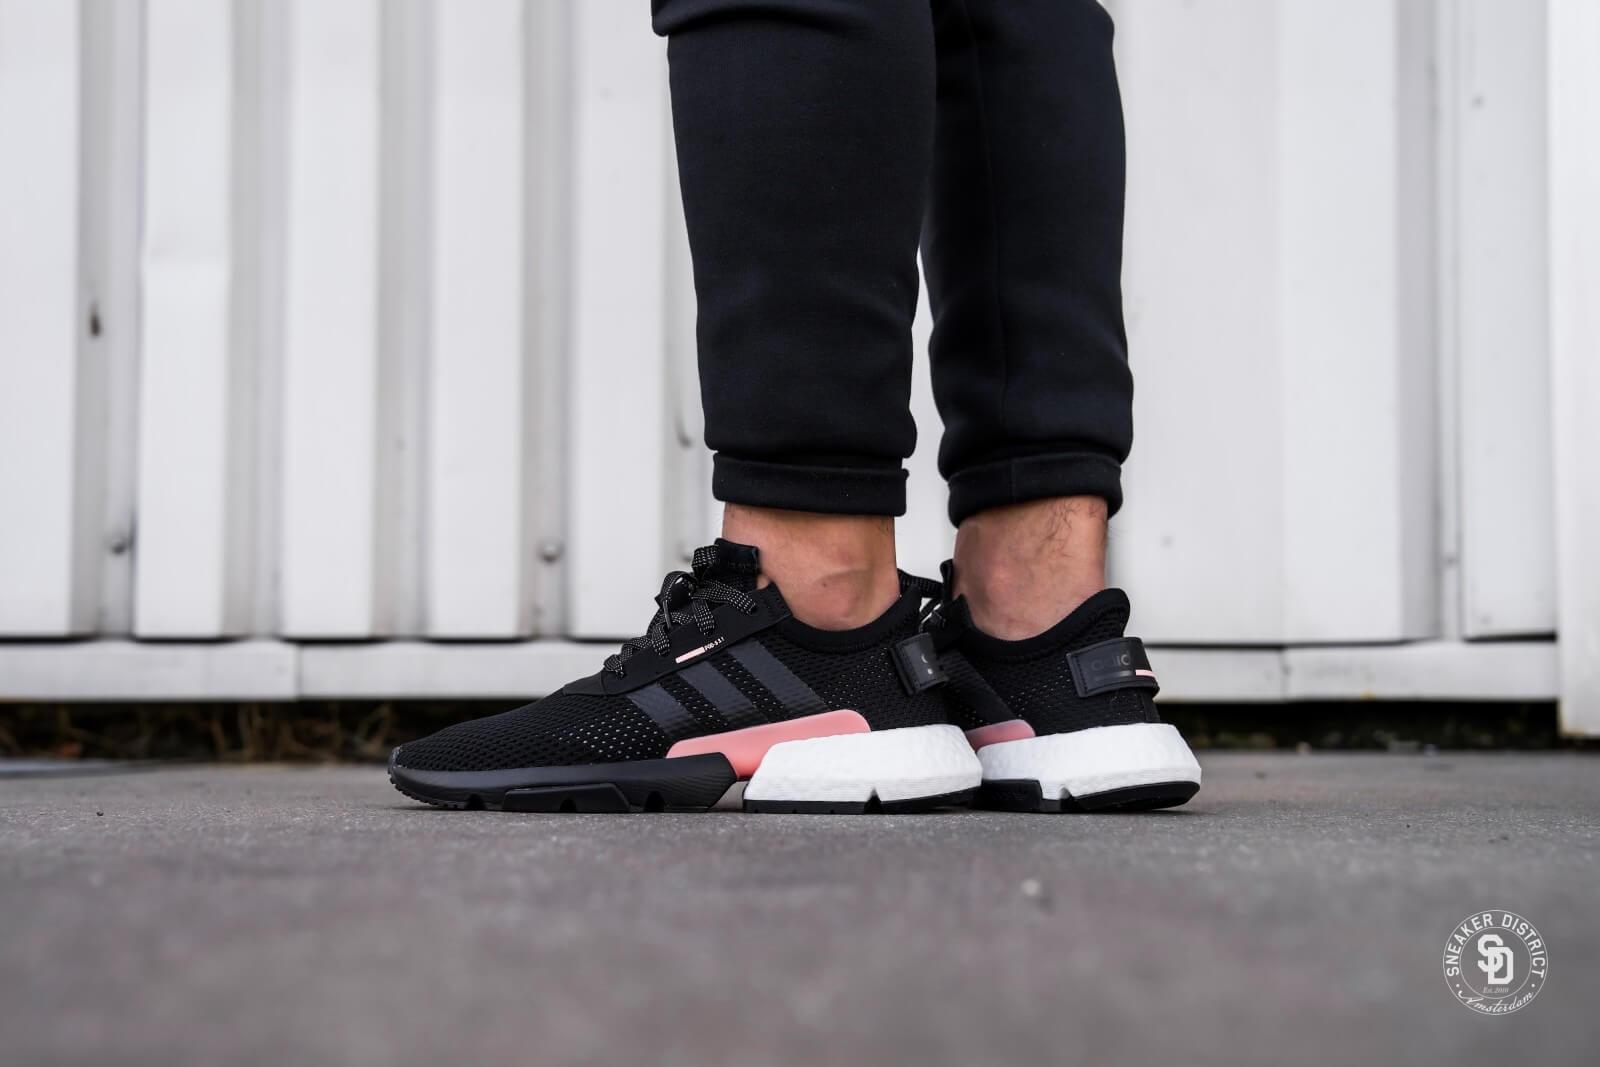 Athletic Shoes B37447 Adidas Men POD S3.1 black core black